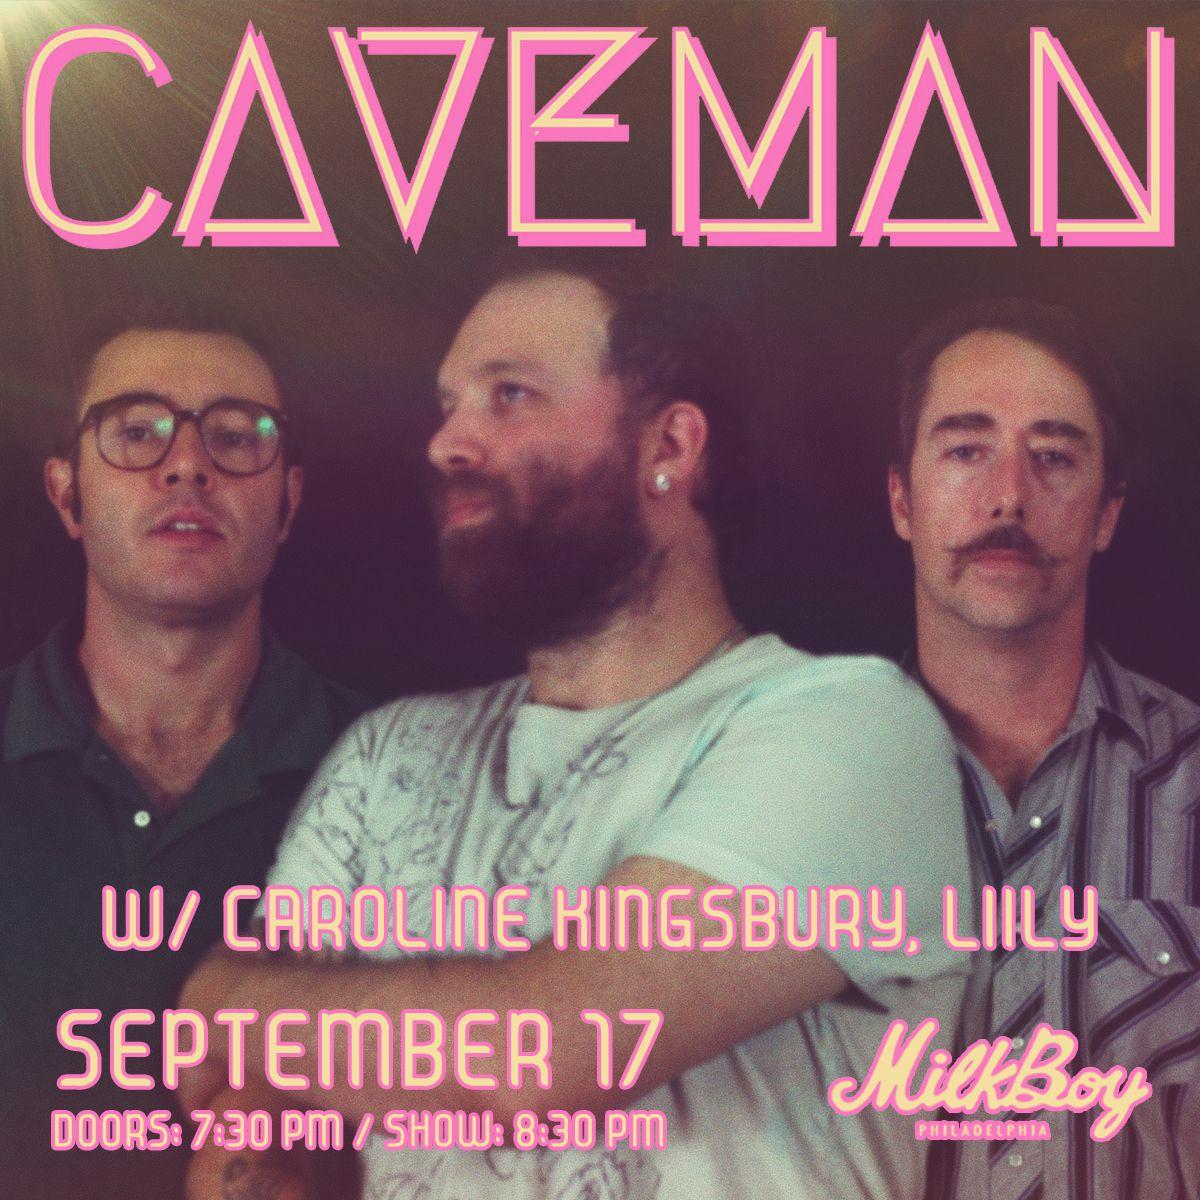 Caveman: